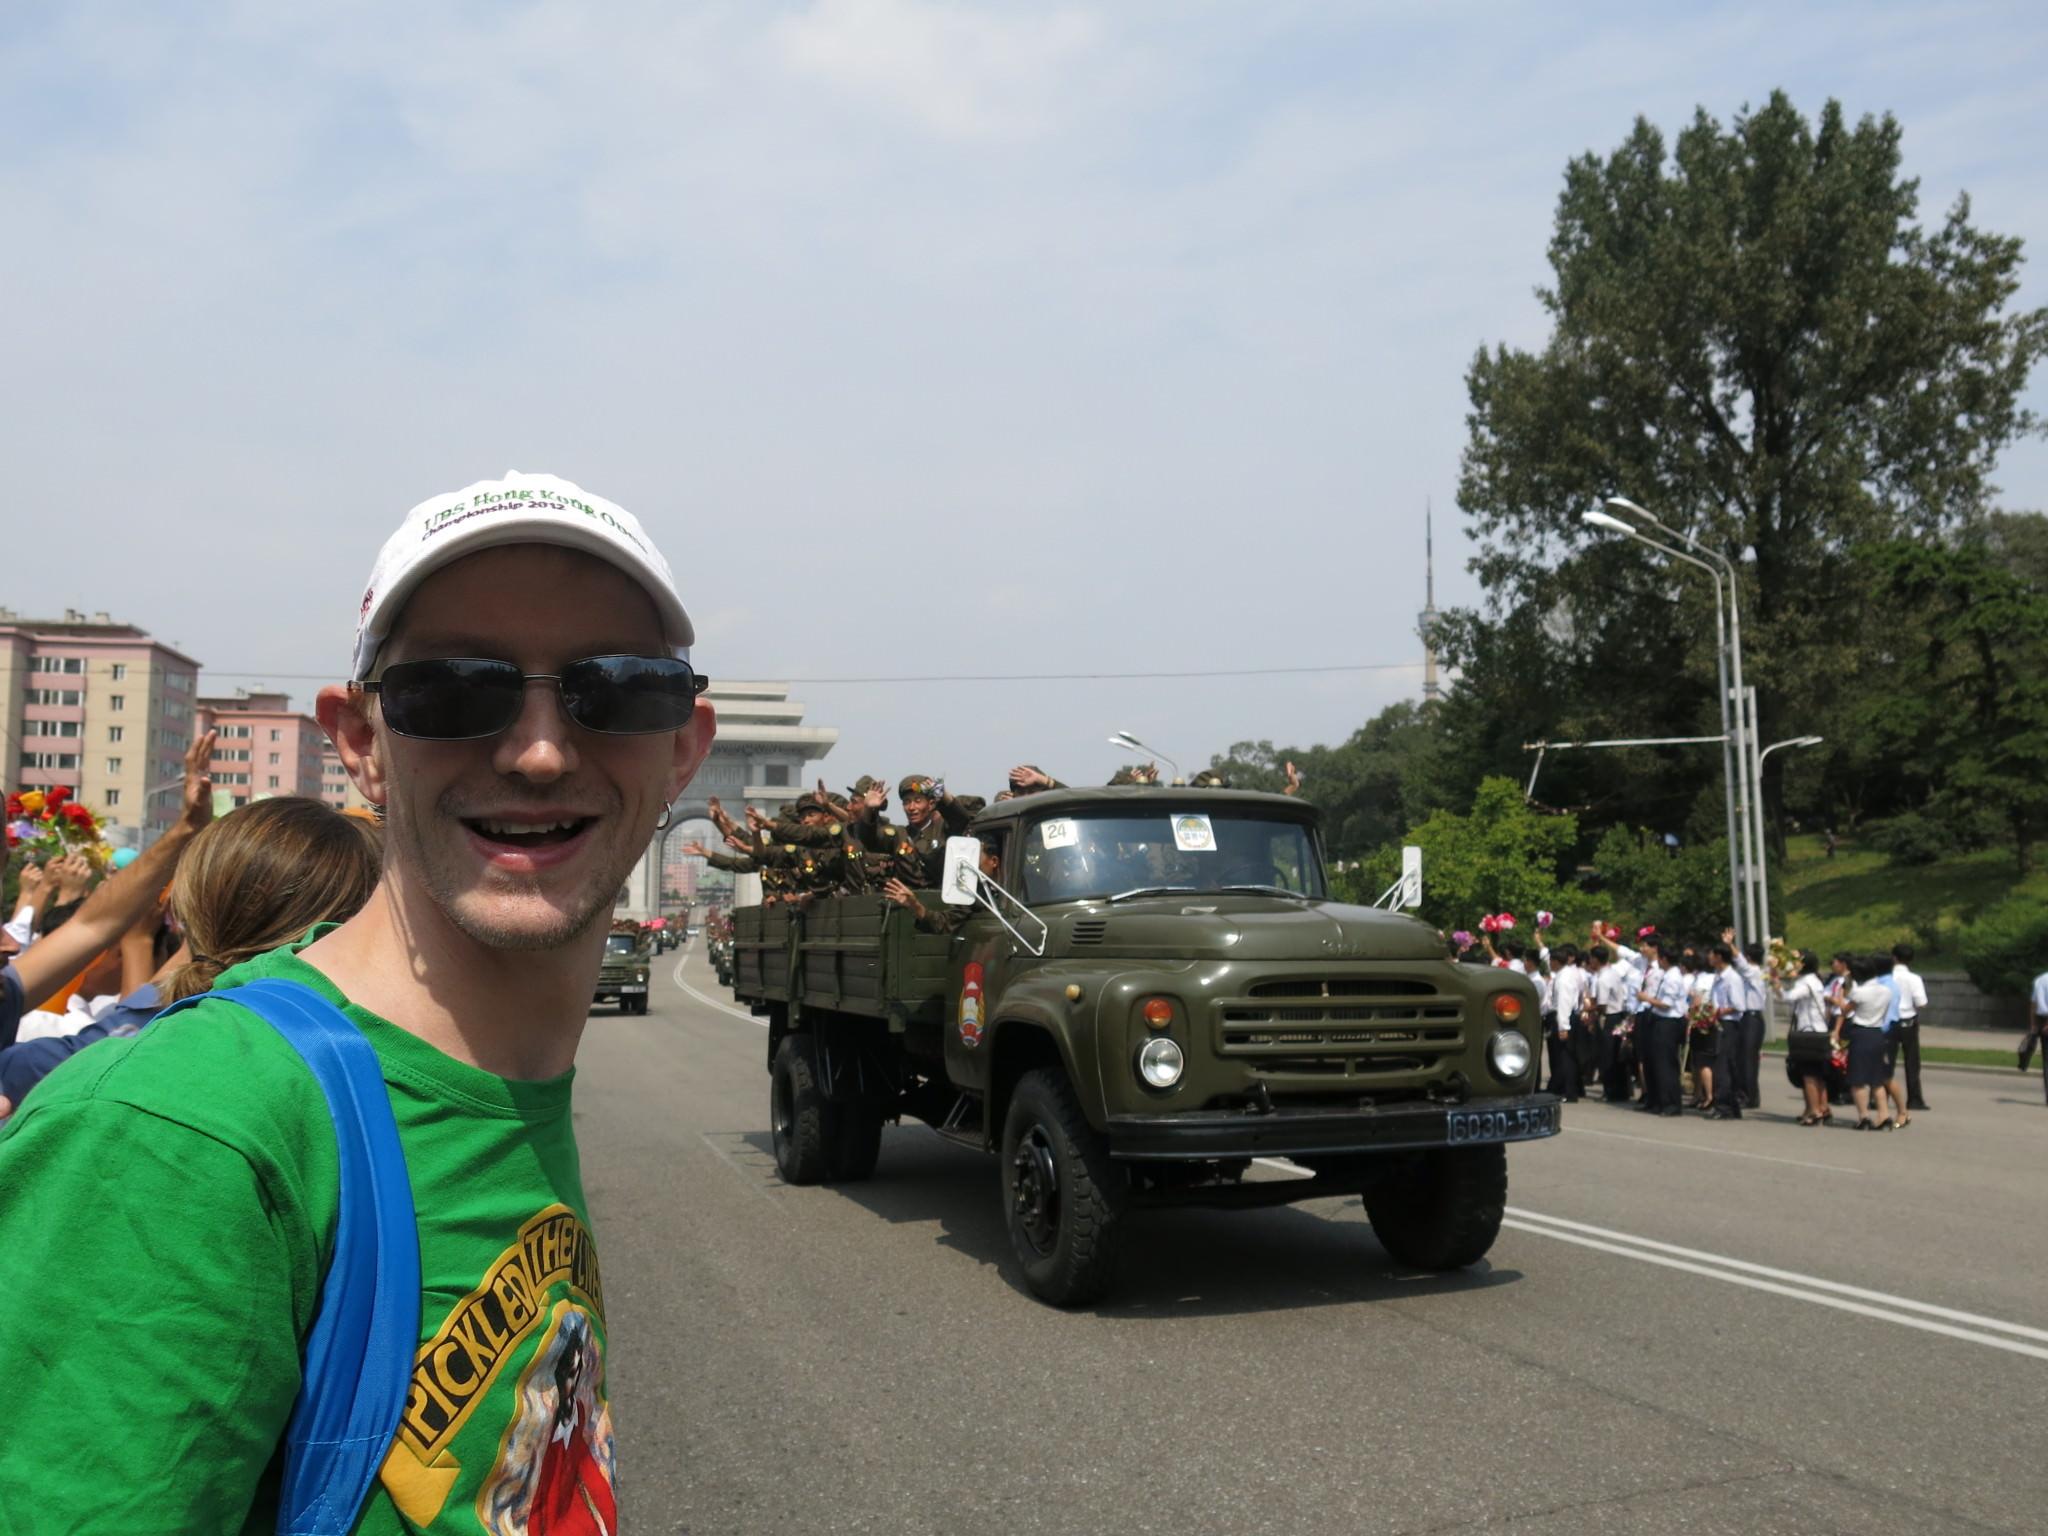 9th september 2013 national day parade in pyongyang north korea